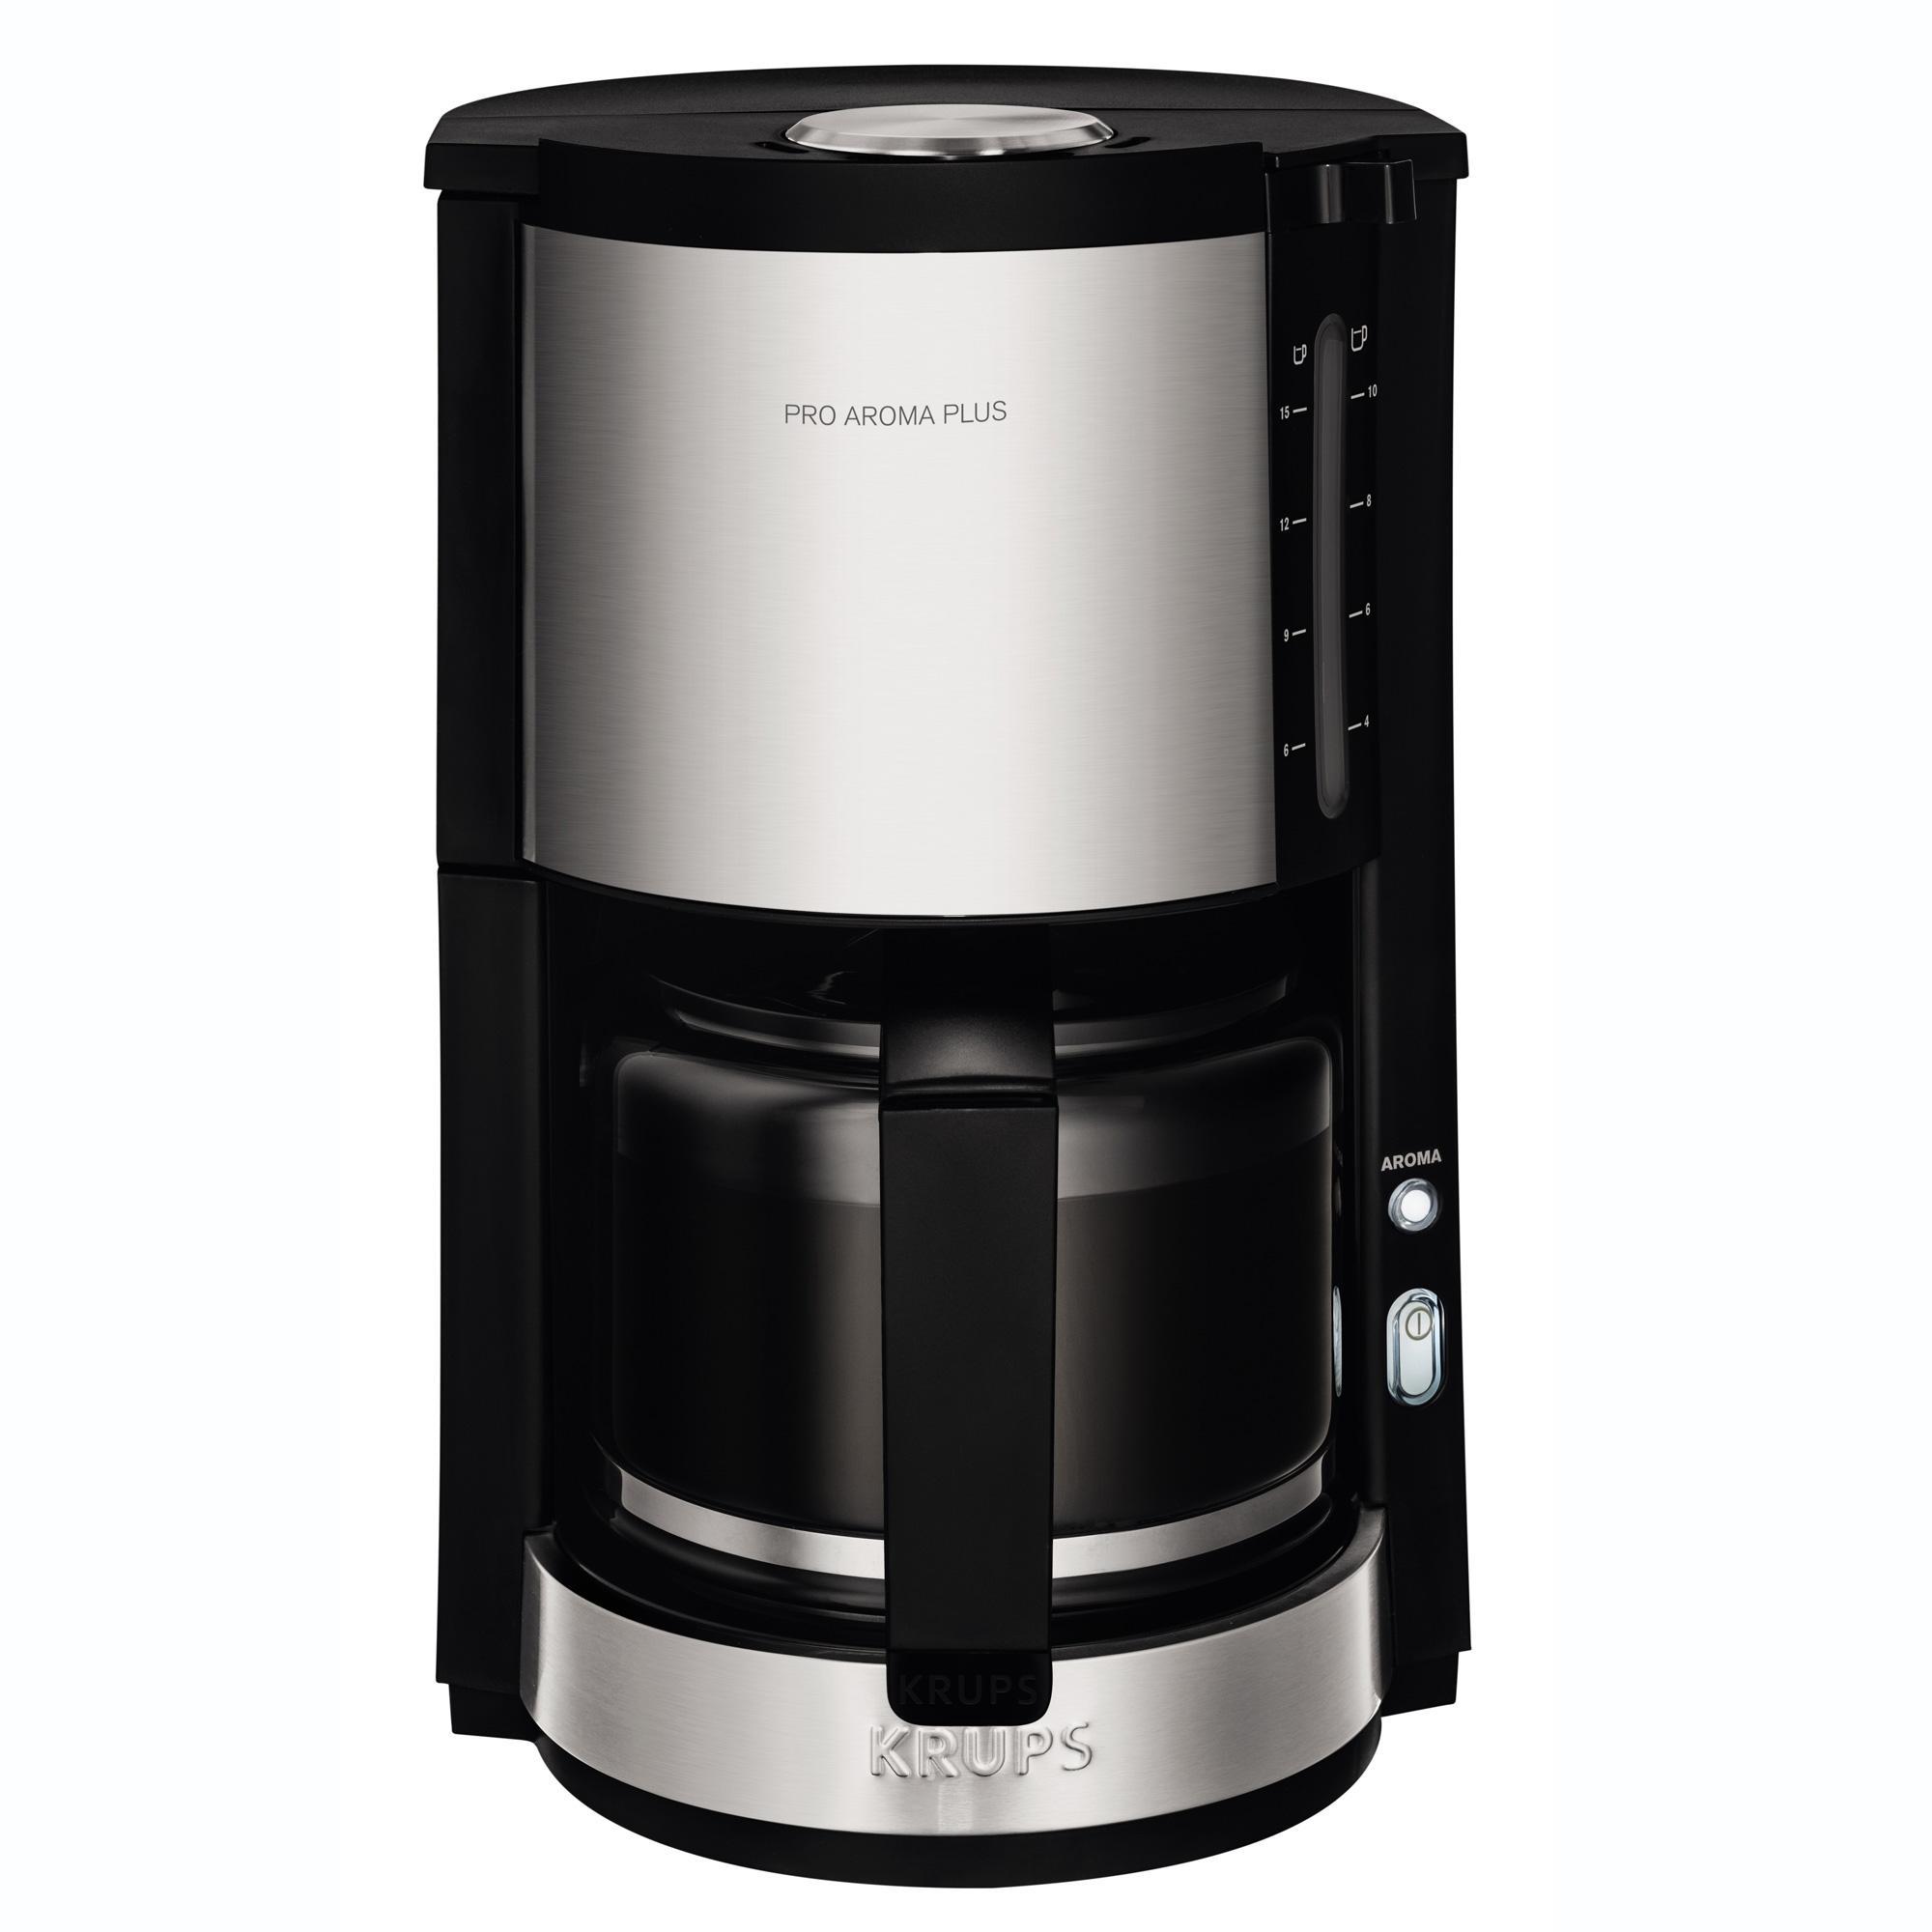 krups km321 proaroma plus glaskaffeemaschine, 10 tassen  ~ Kaffeemaschine Heißbrühsystem